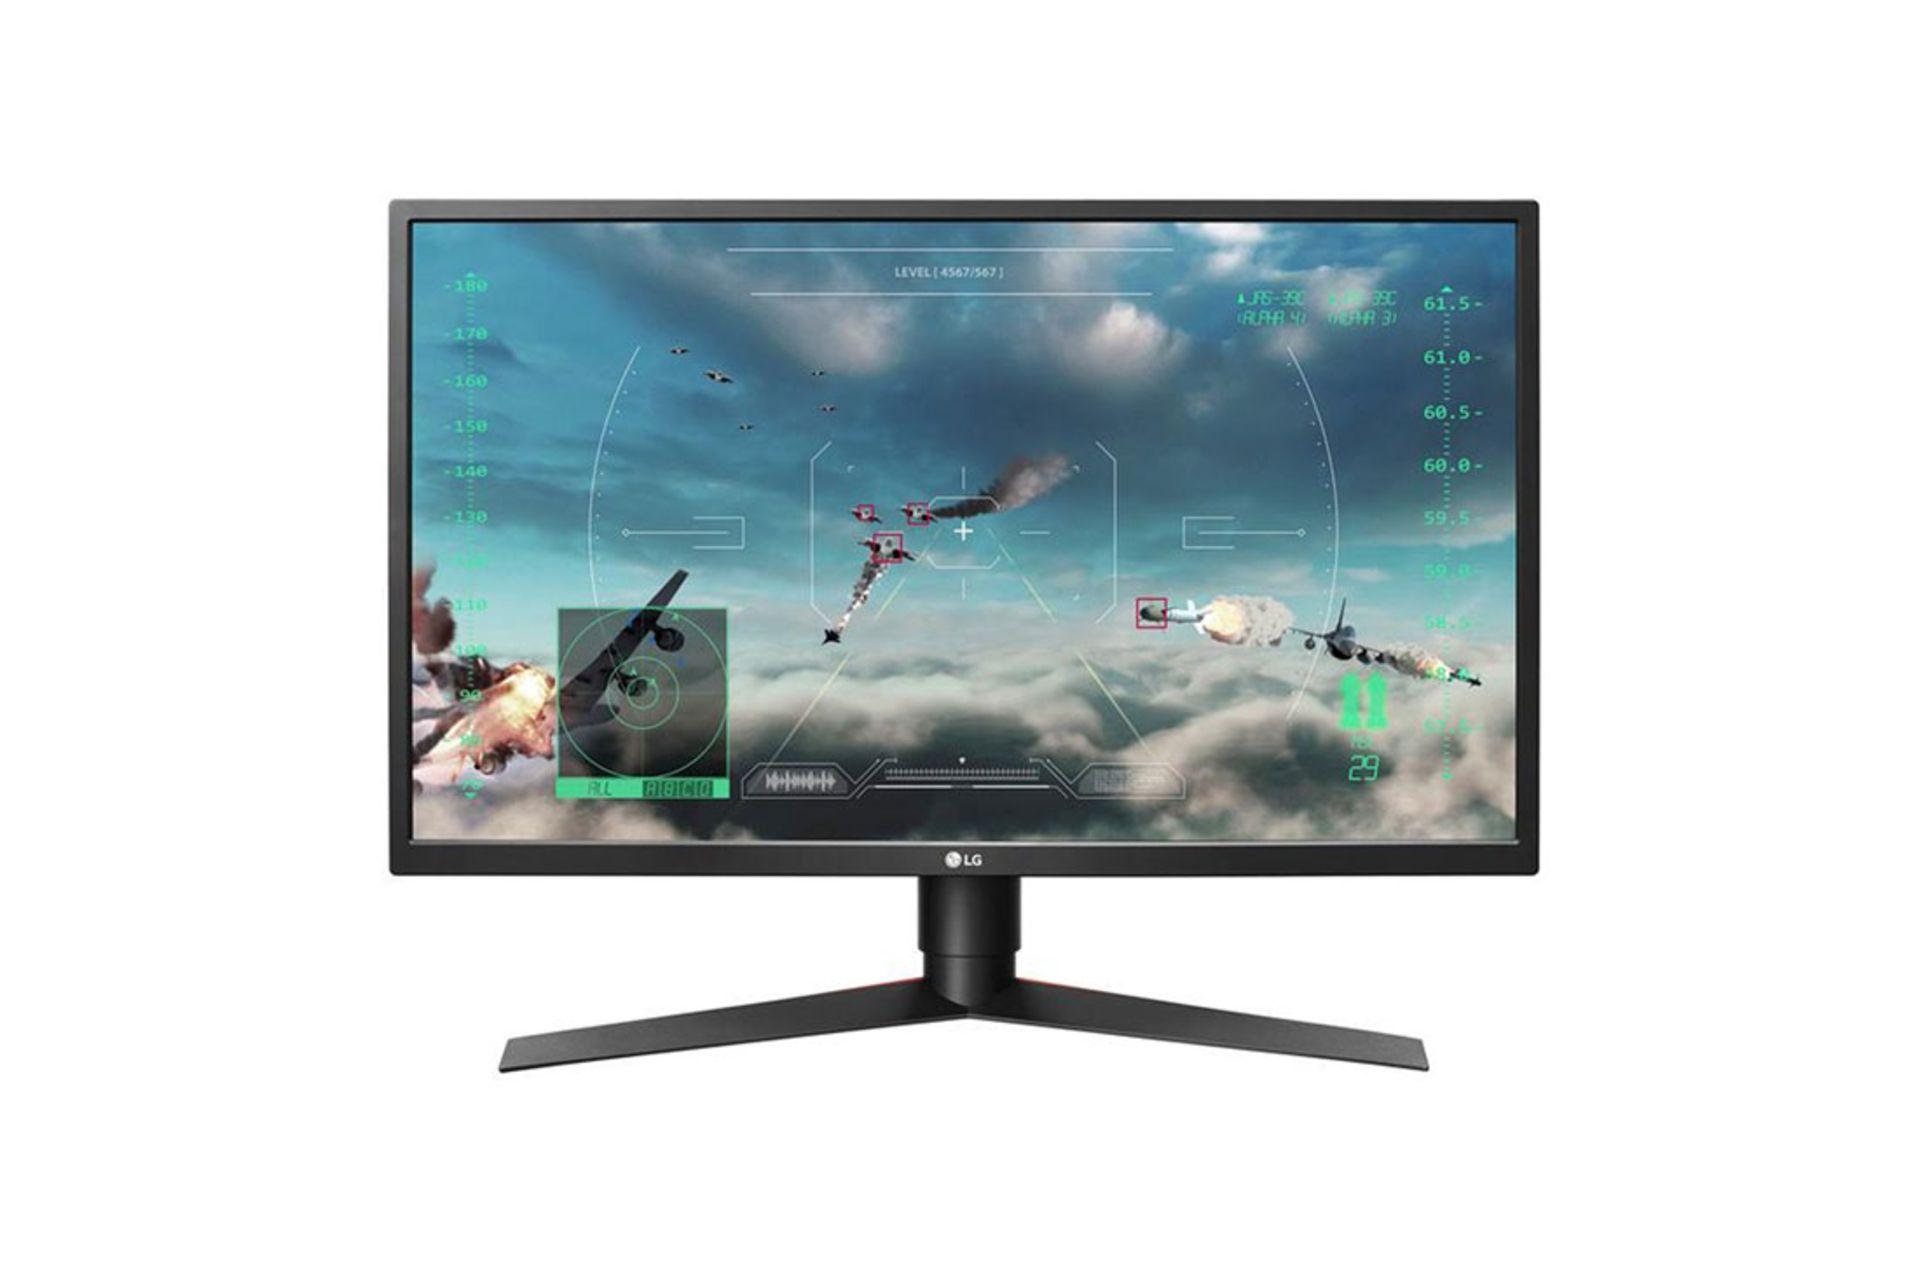 Lotto 30043 - V Grade A LG 27 Inch FULL HD GAMING LED MONITOR - HDMI X 2, DISPLAYPORT, USB 3.0 X 227GK750F-B